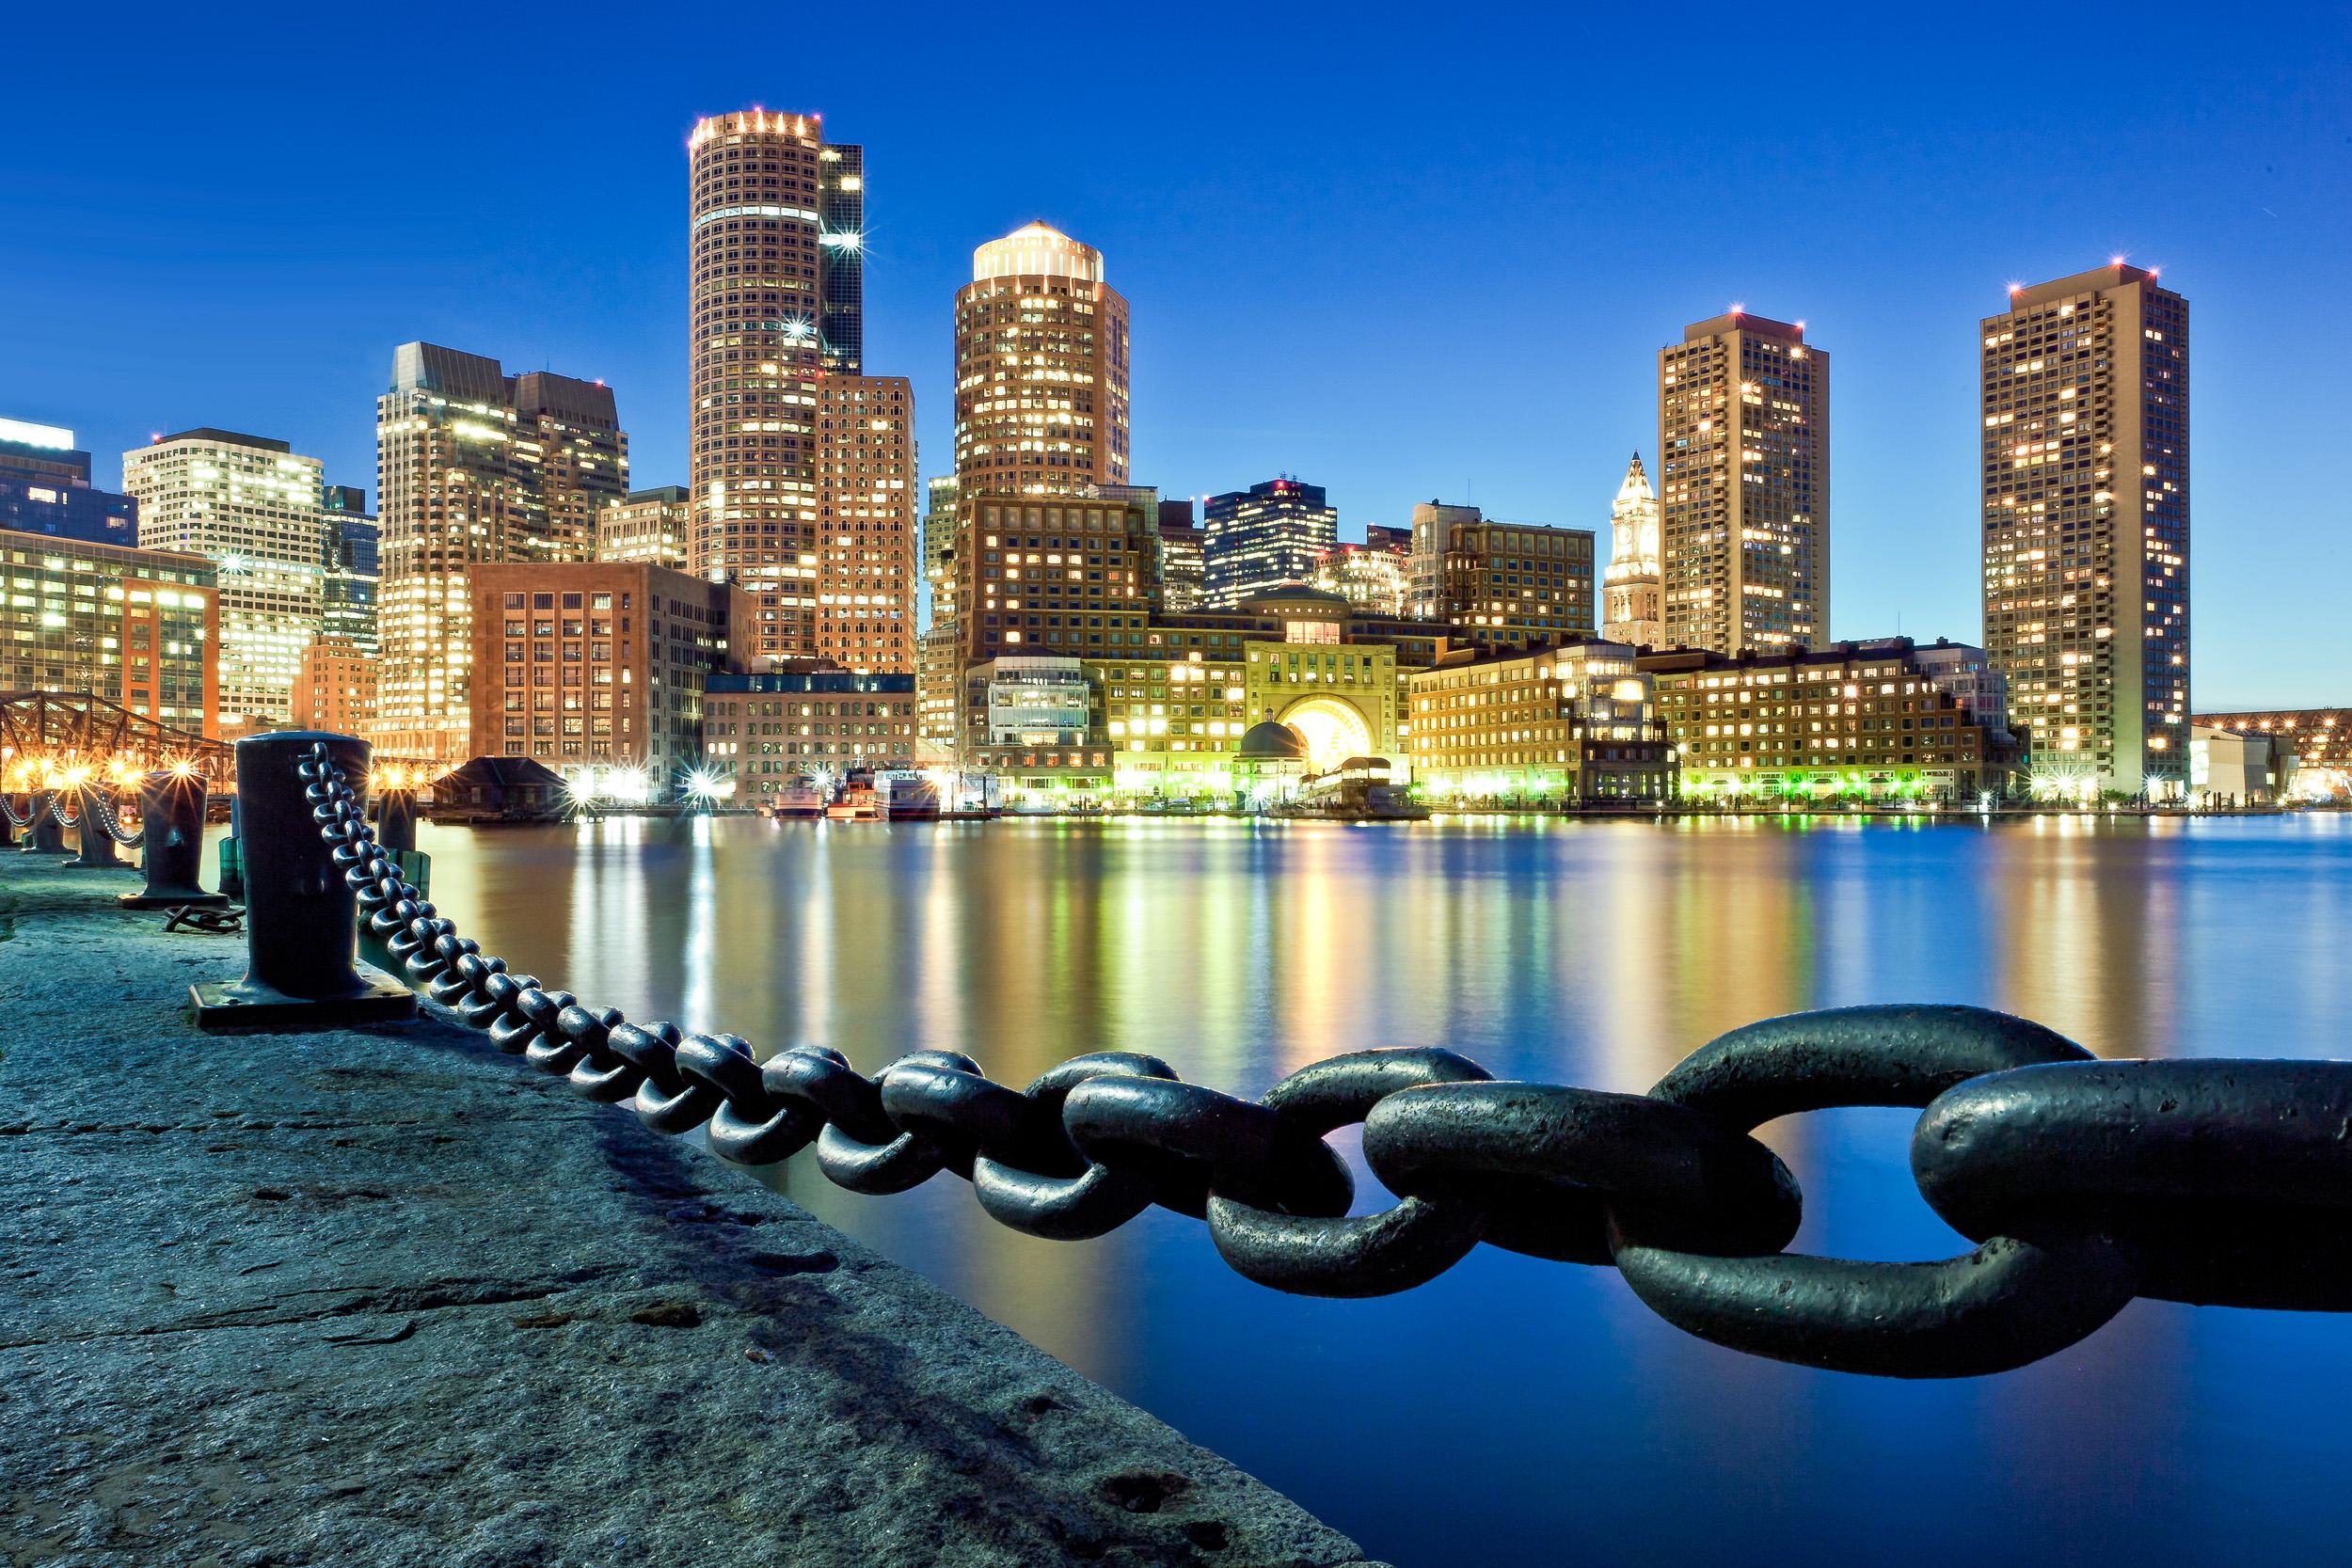 Boston_waterfront_night_Miami_Fort_Lauderdale_commercial_photographer_Franklin_Castillo-Edit.jpg